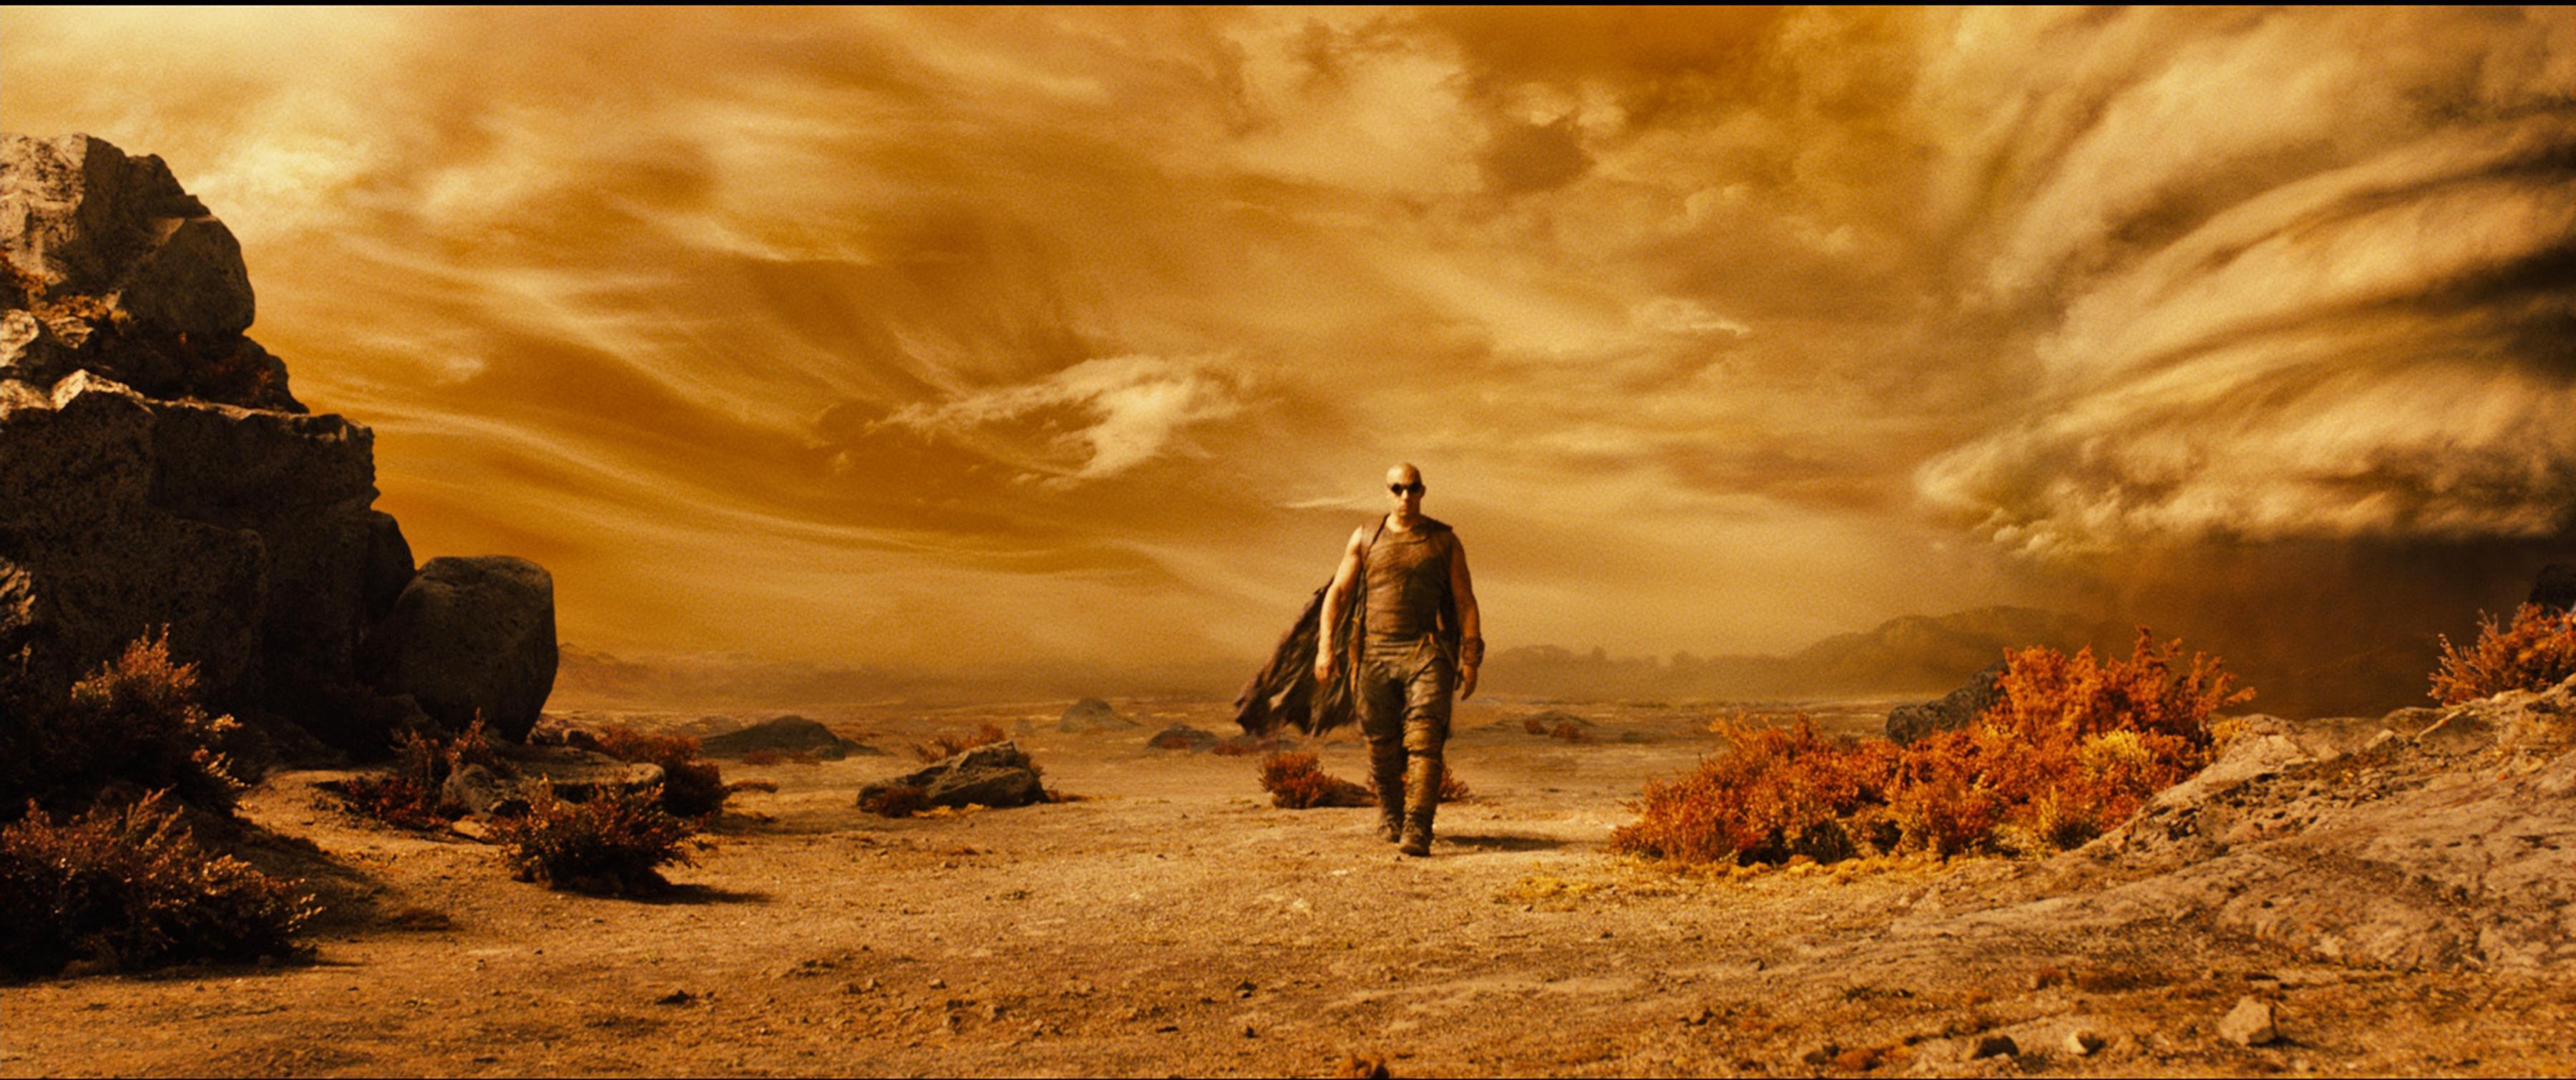 Riddick 3 Movie Review: Riddick